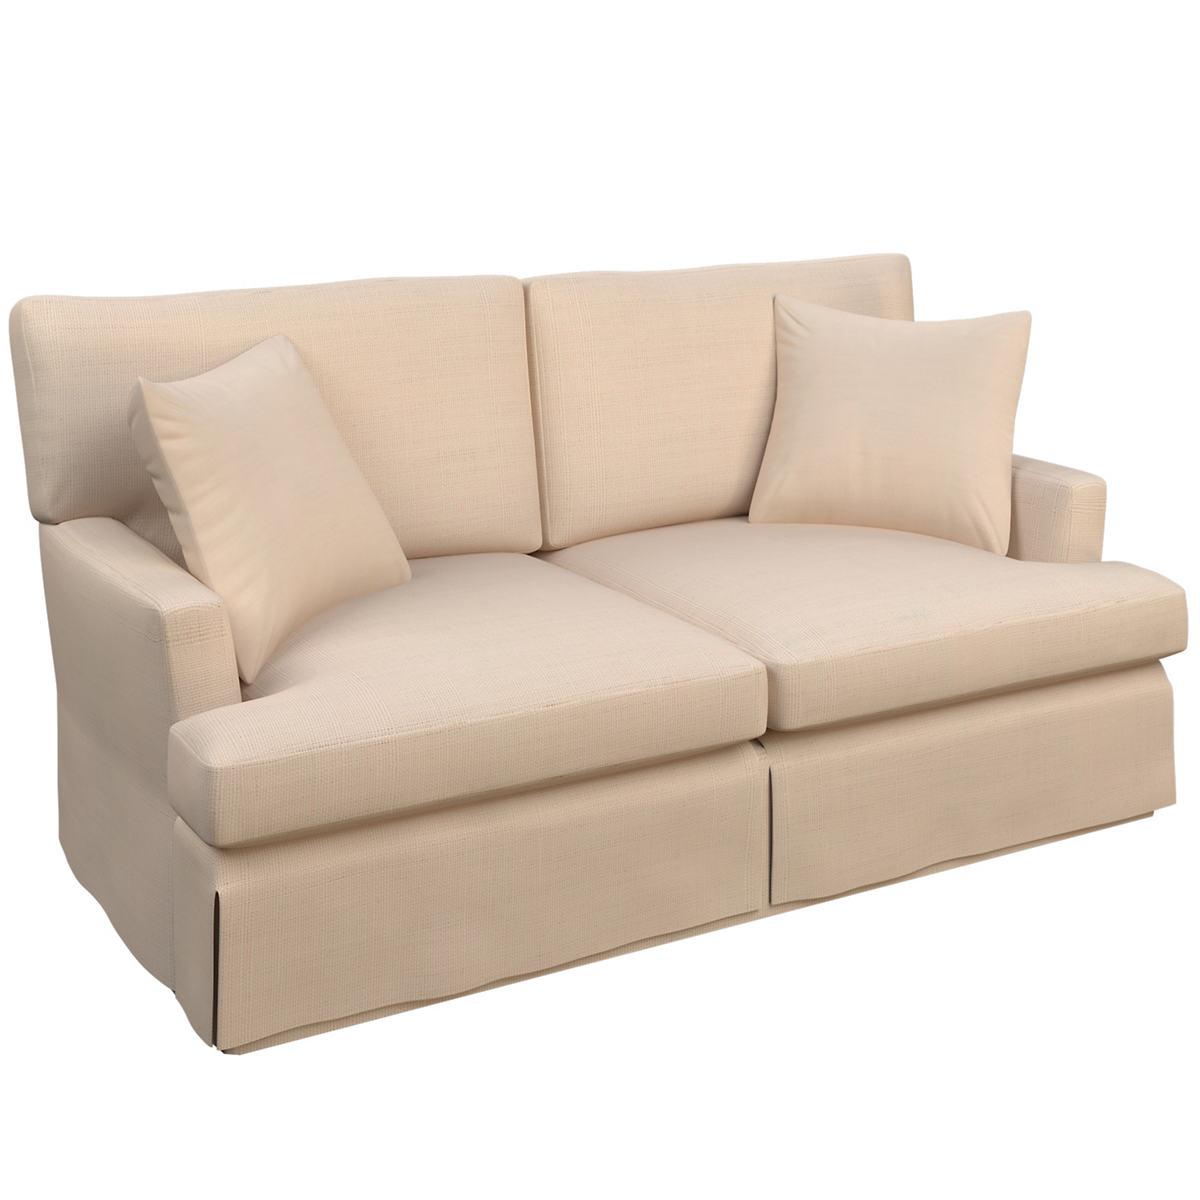 Solstice Petal Saybrook 2 Seater Sofa